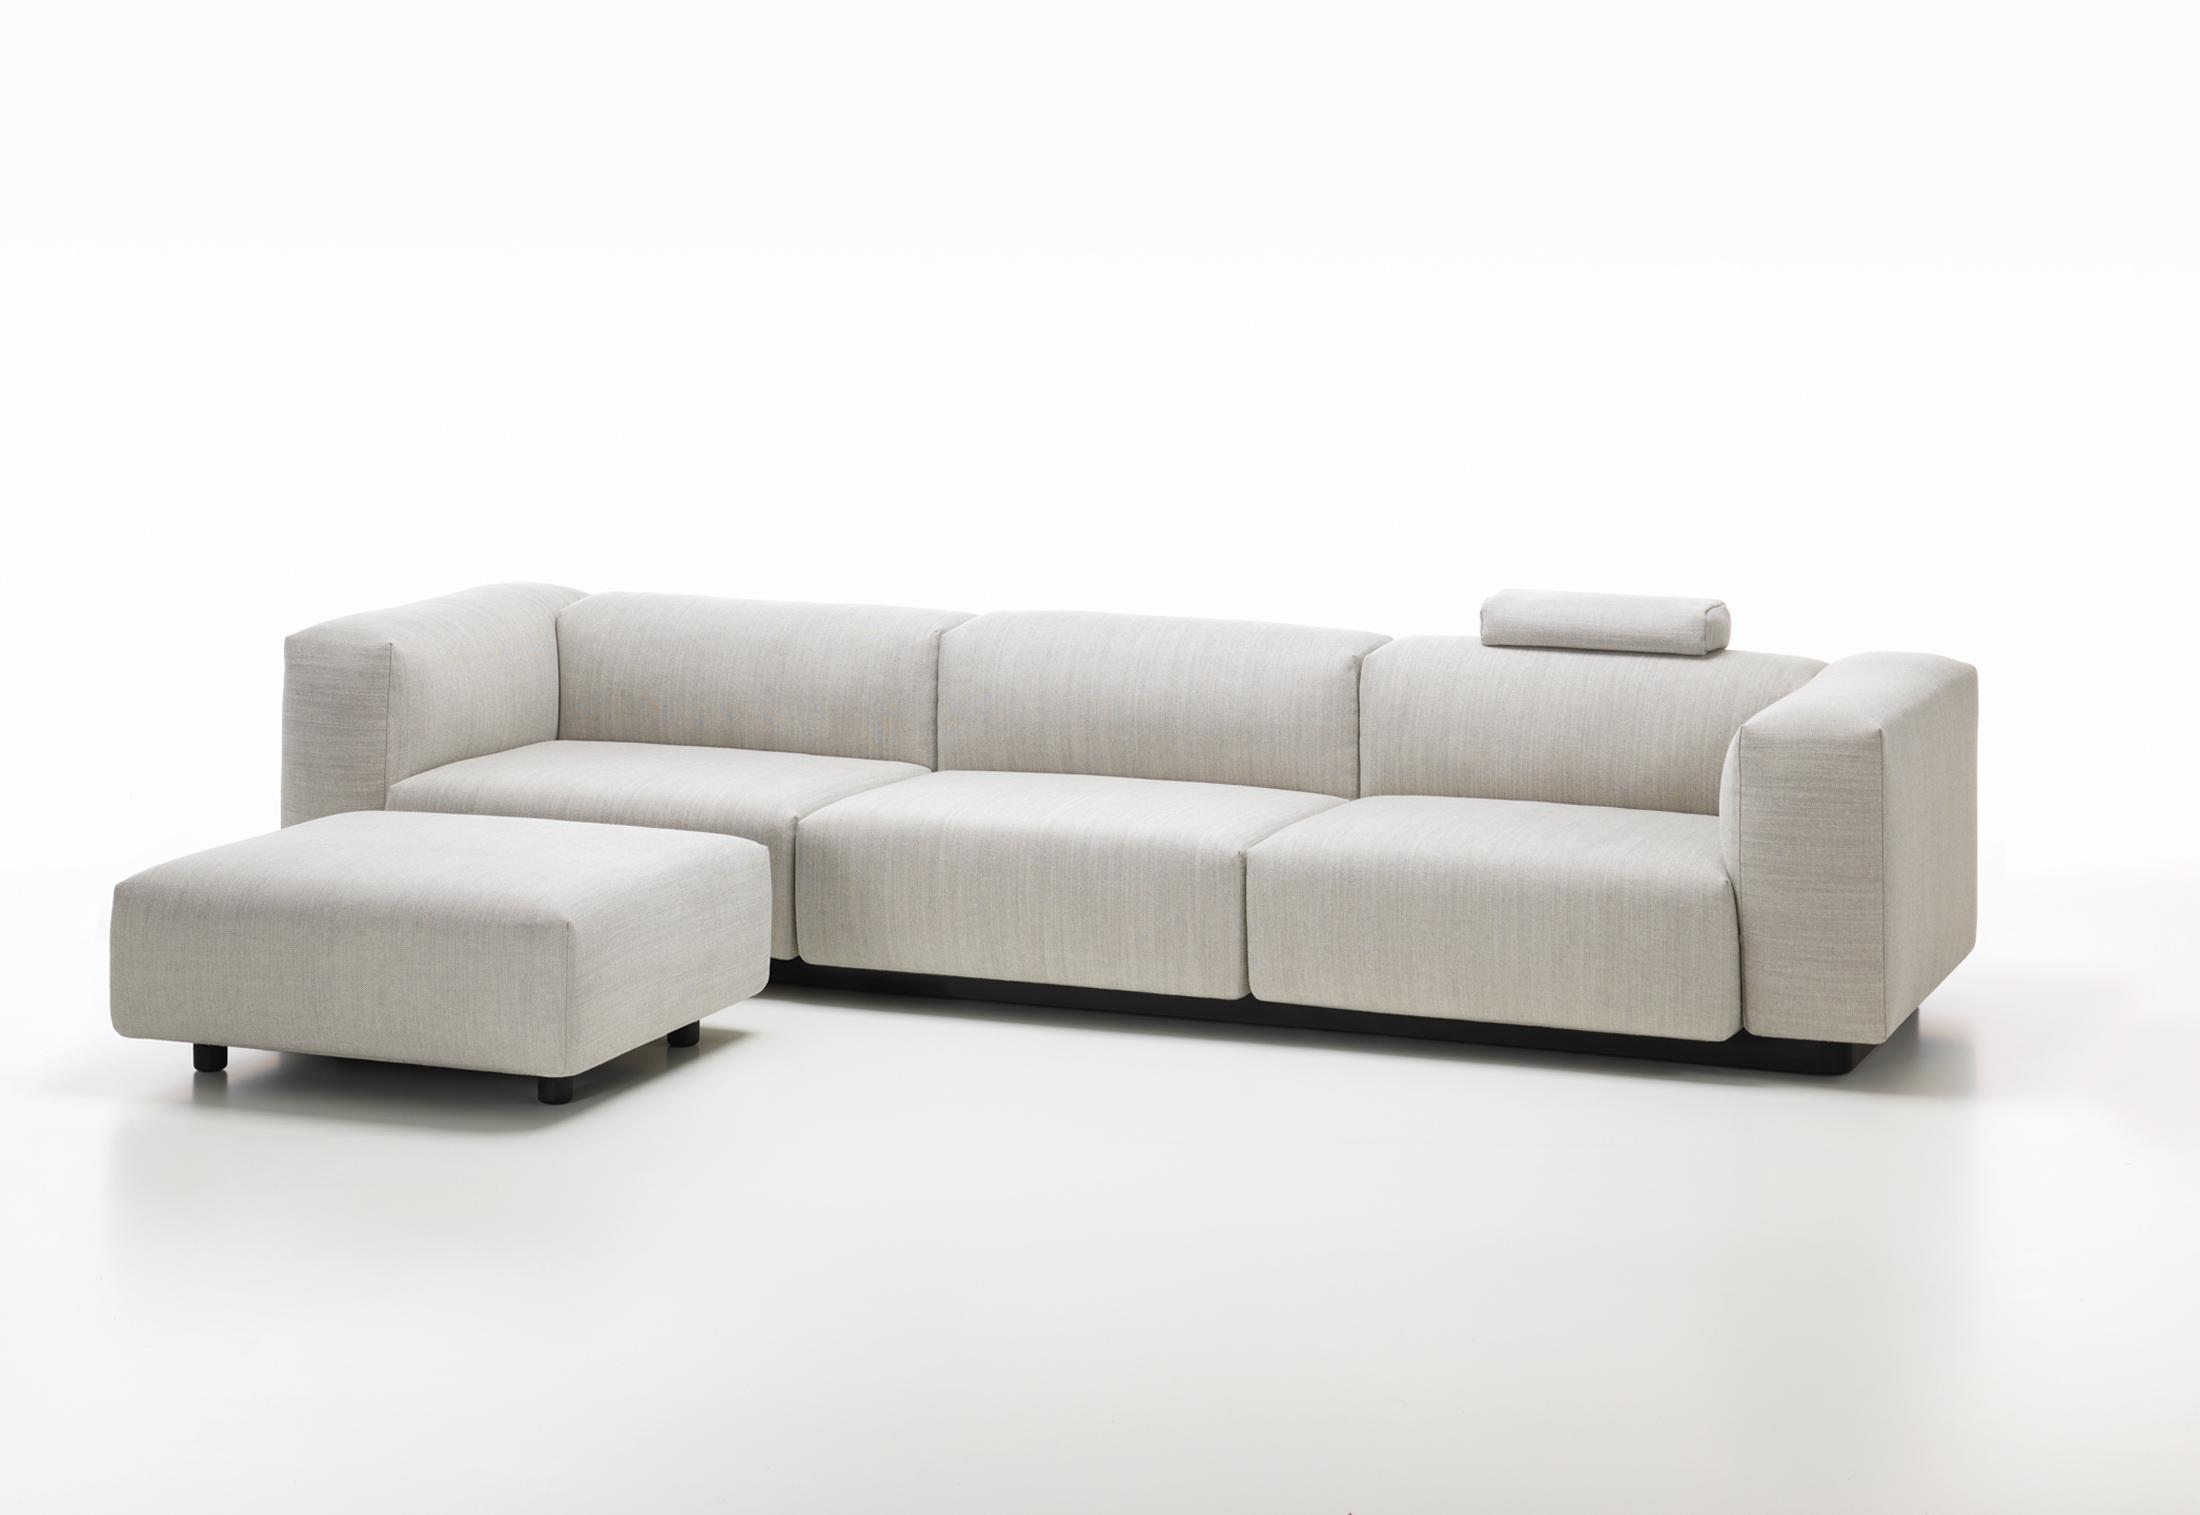 New design sofa corner sofa L shape sofa-in Living Room